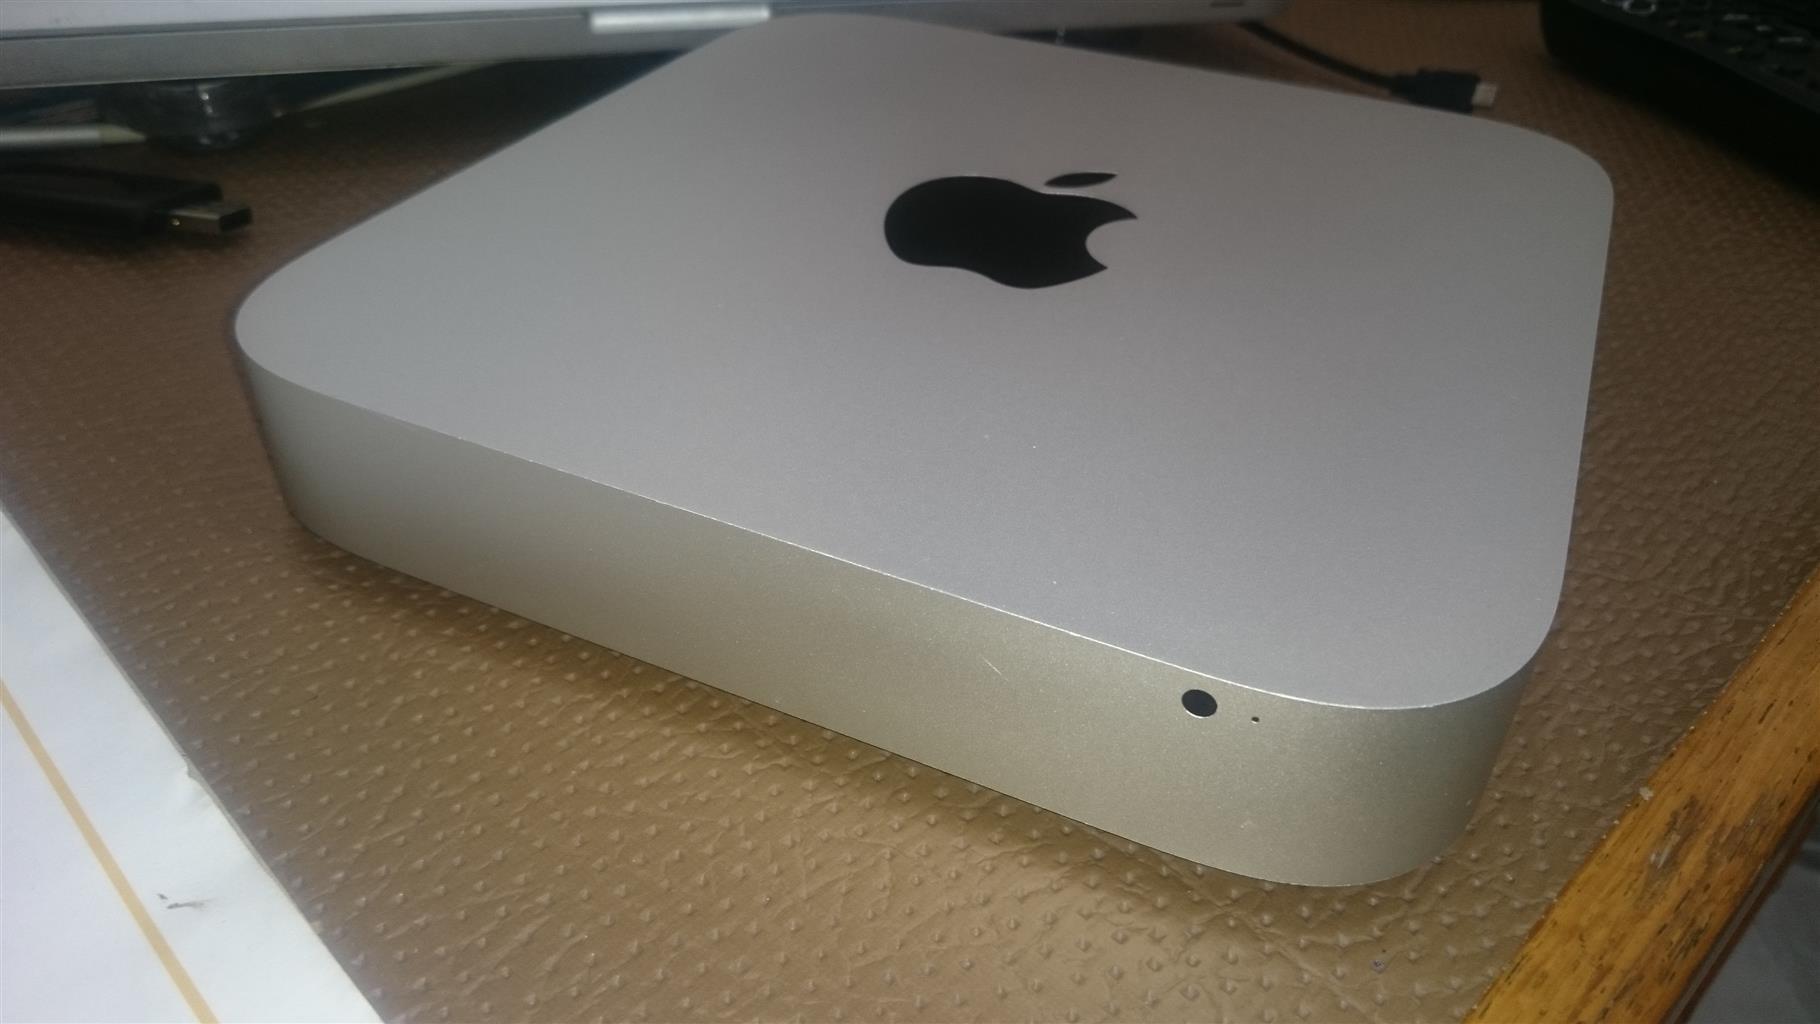 Scarce Mac Mini with Intel Integrated Graphics